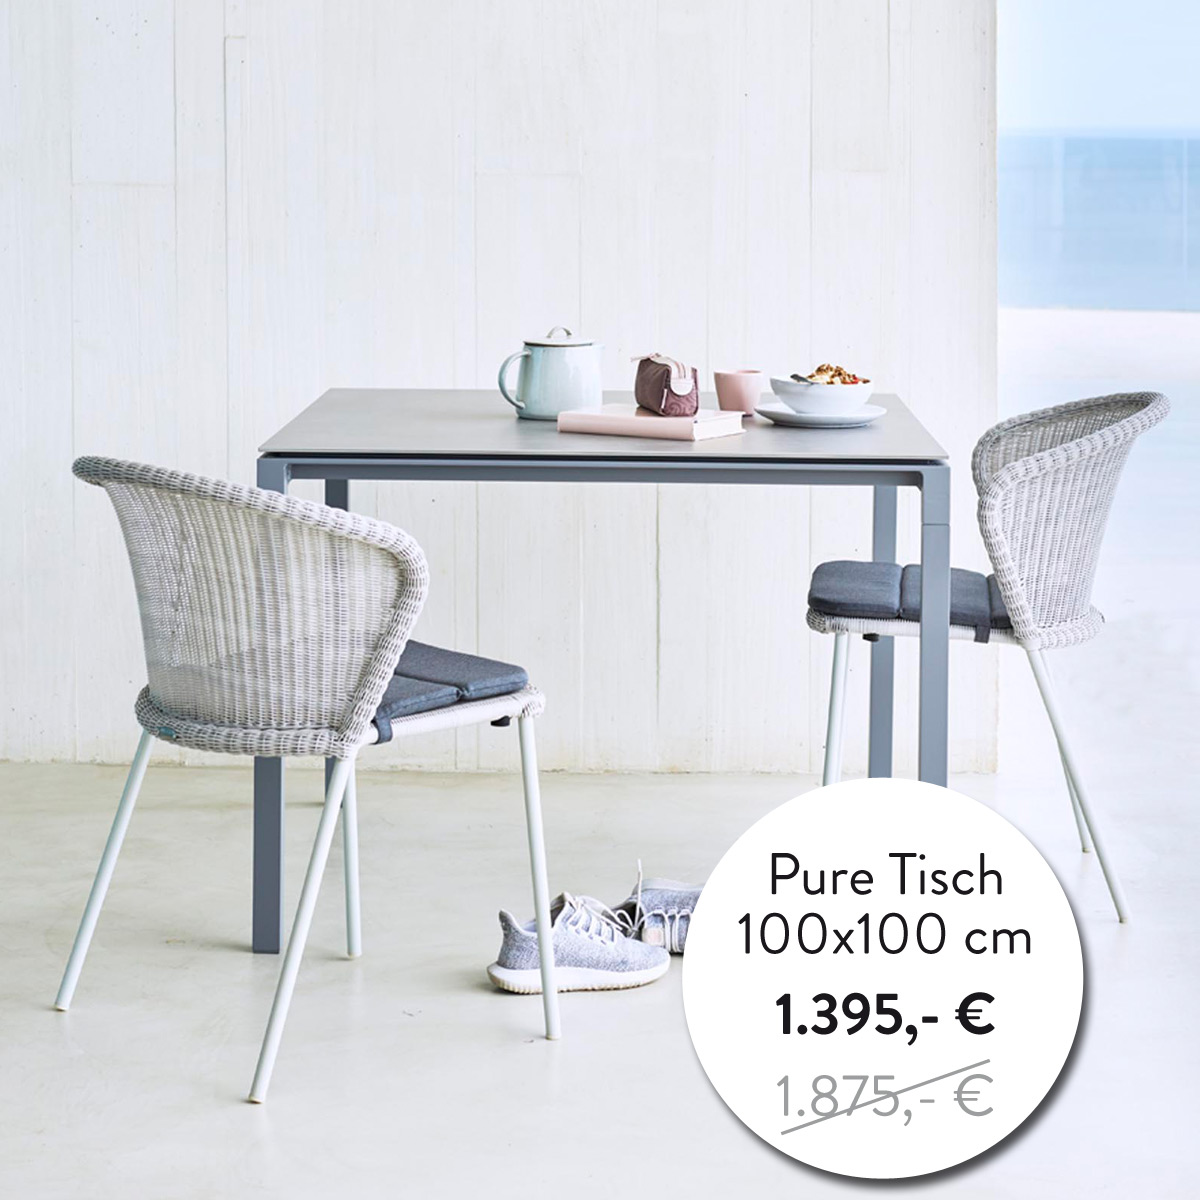 Pure Esstisch 100x100 cm